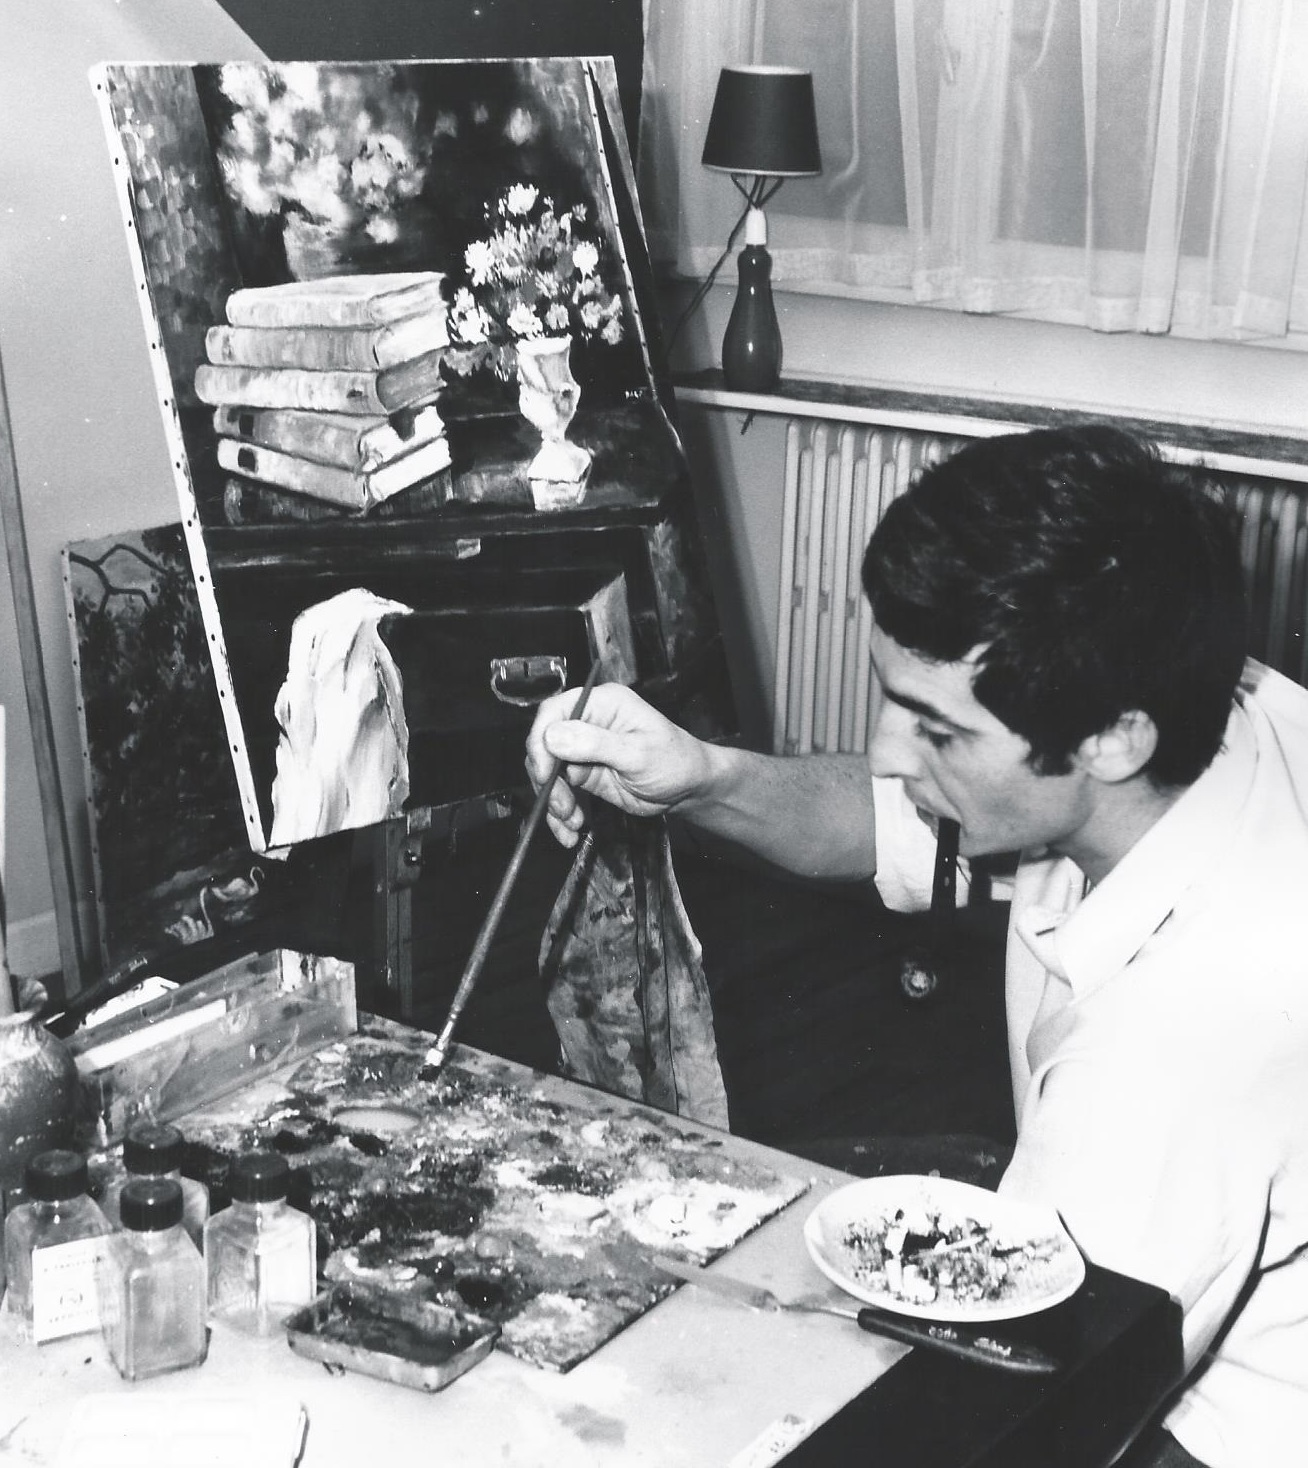 Darot dans son atelier 1969